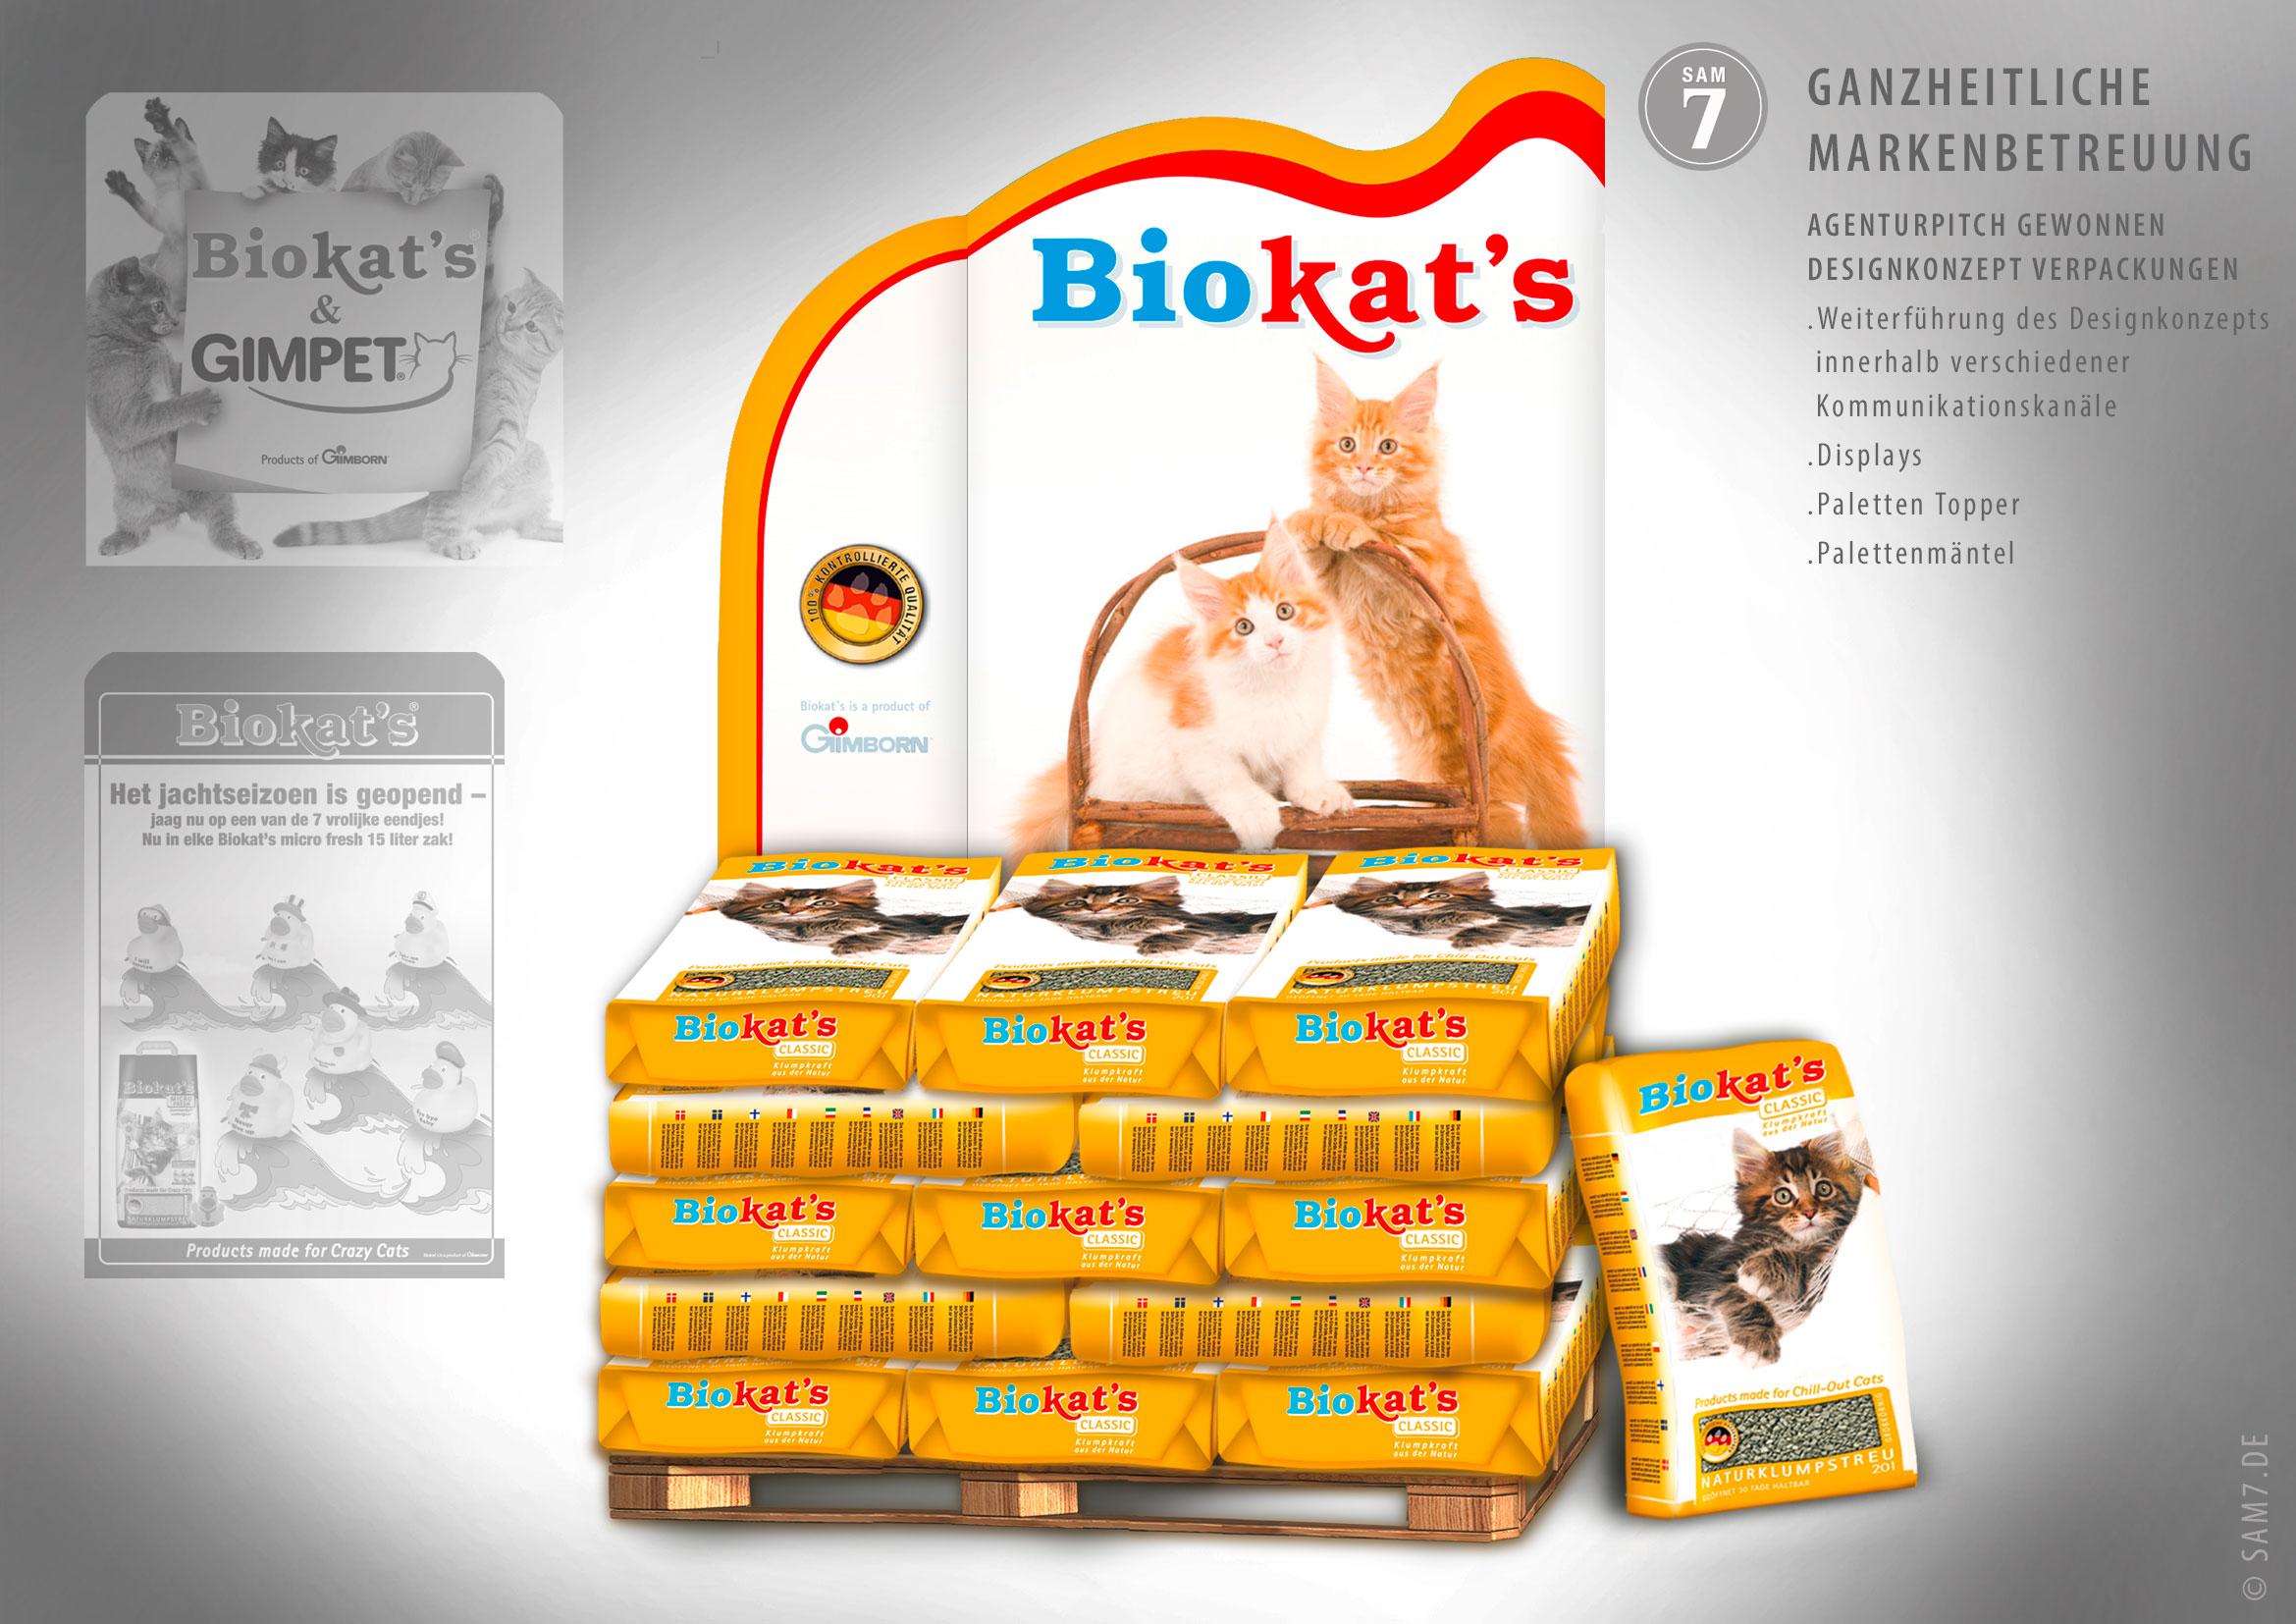 Designkonzept Biokats. Displaygestaltung.